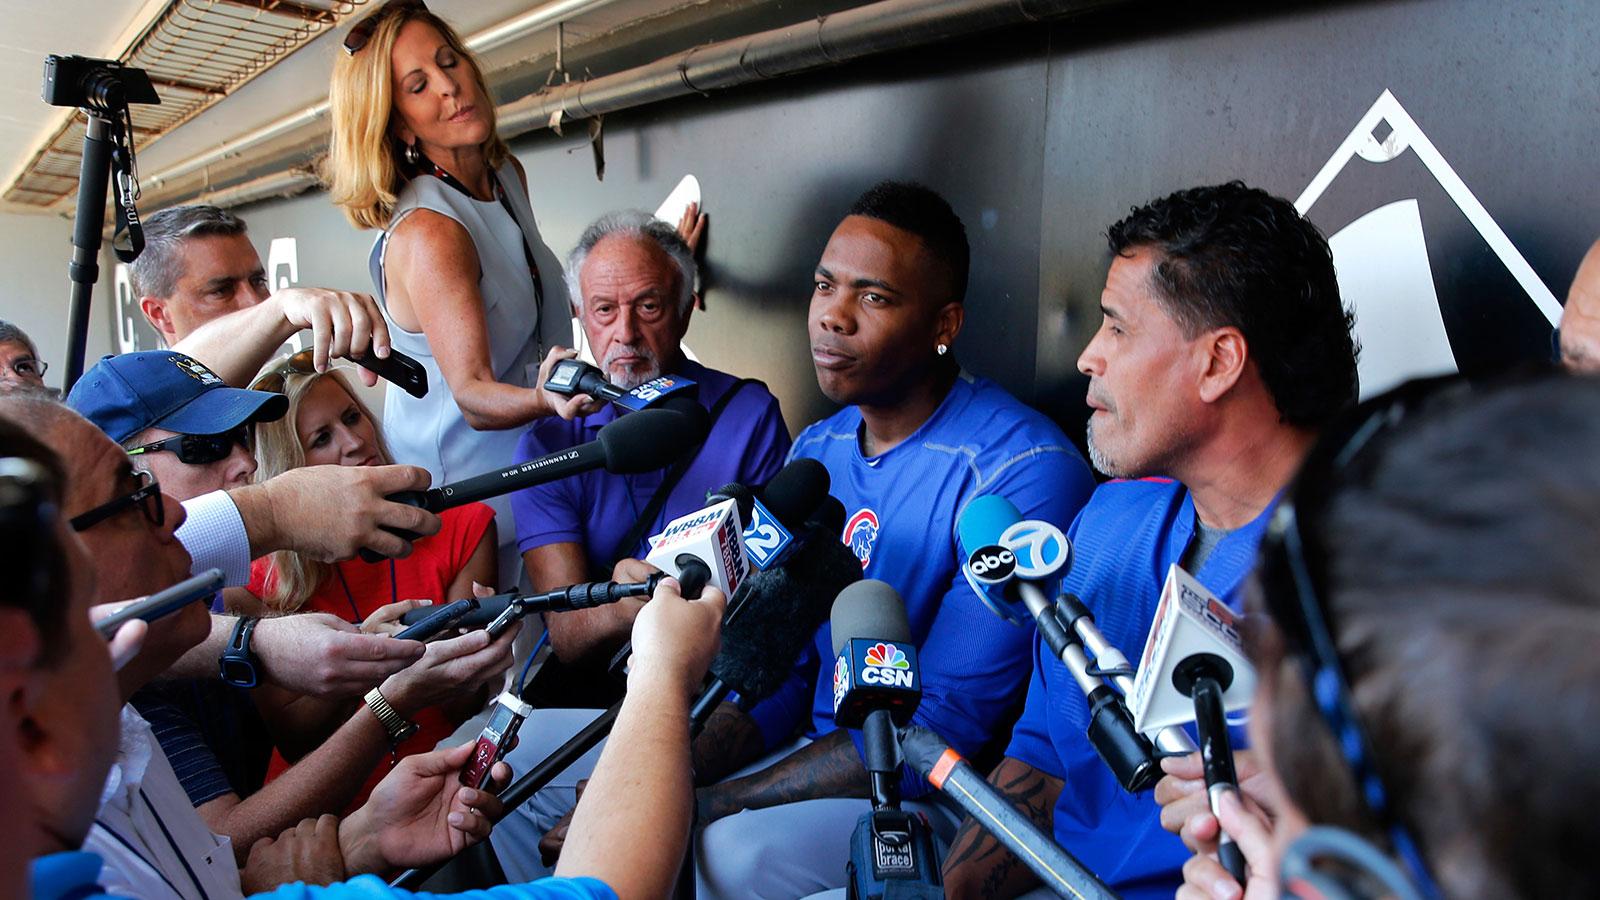 New Cubs closer Aroldis Chapman struggles with tough questions